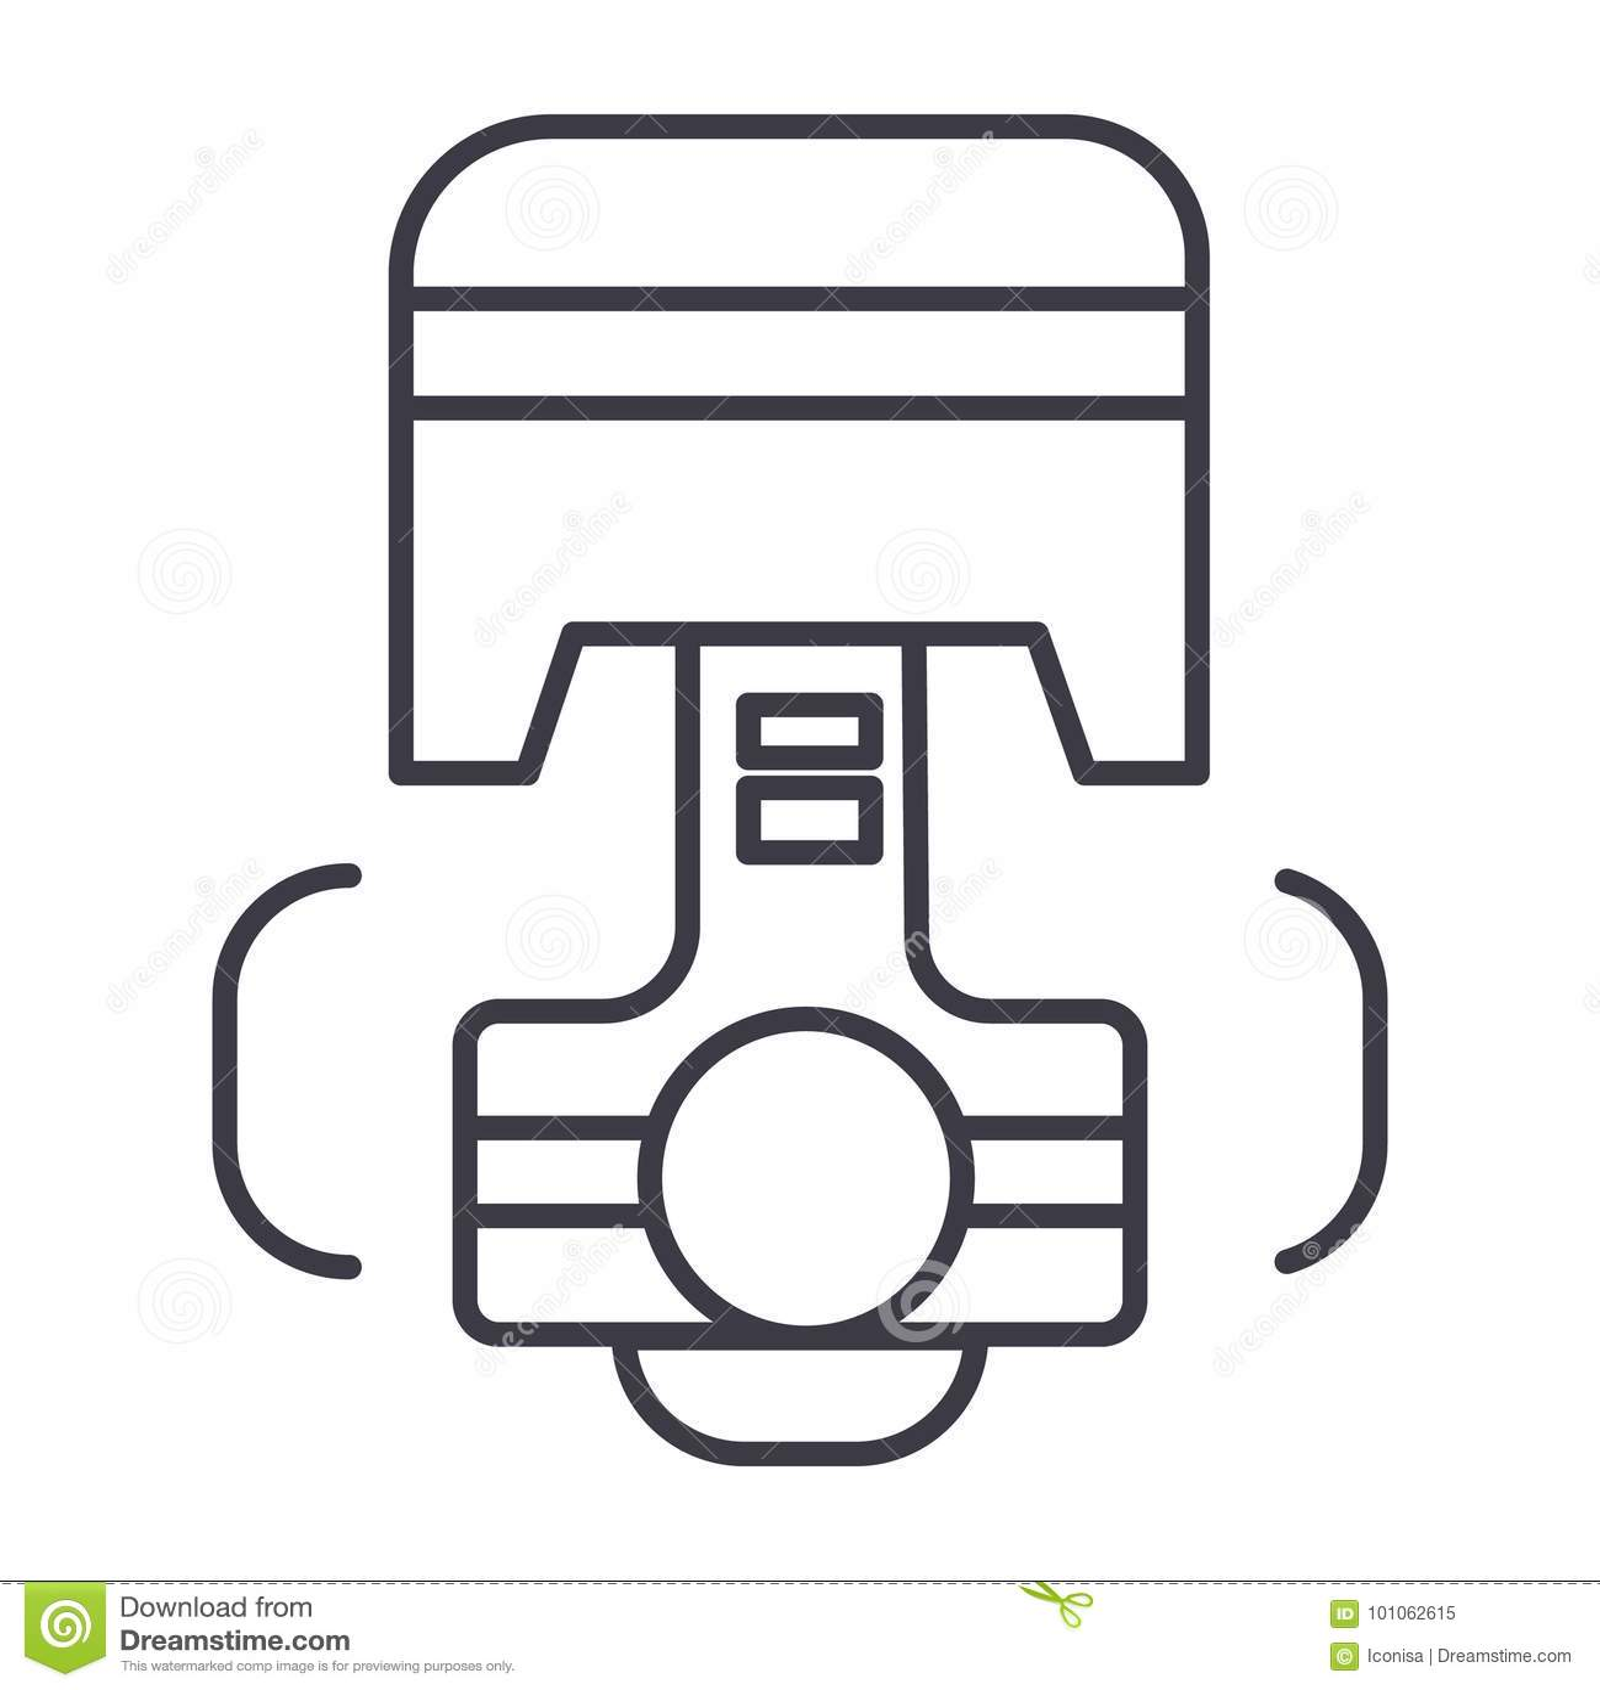 WRG-3991] Car Engine Piston Diagram